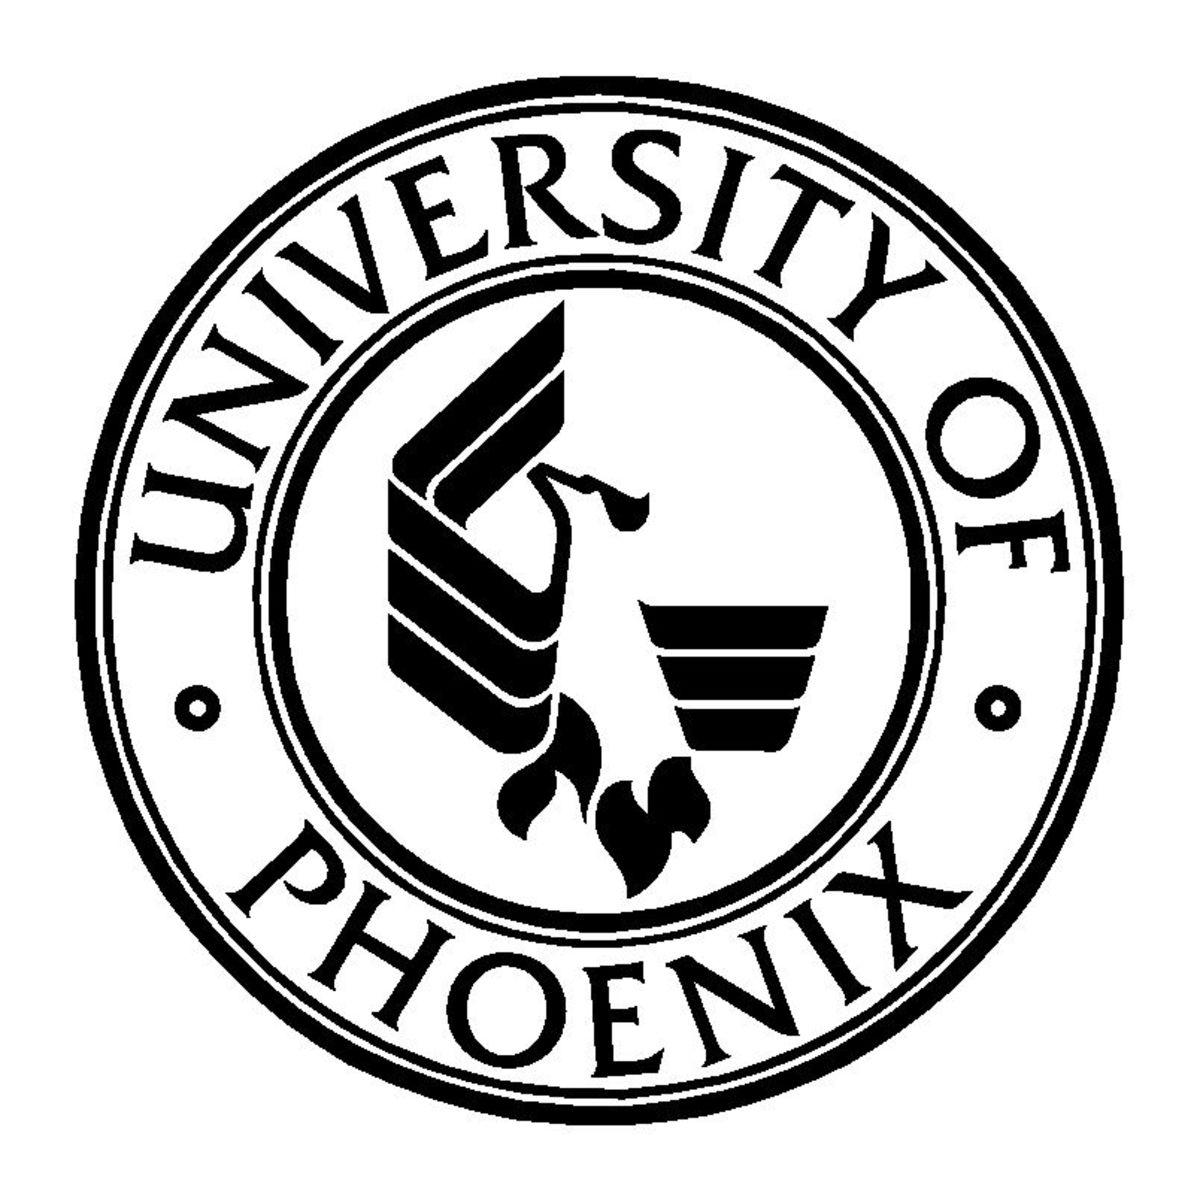 Teaching for university of phoenix?